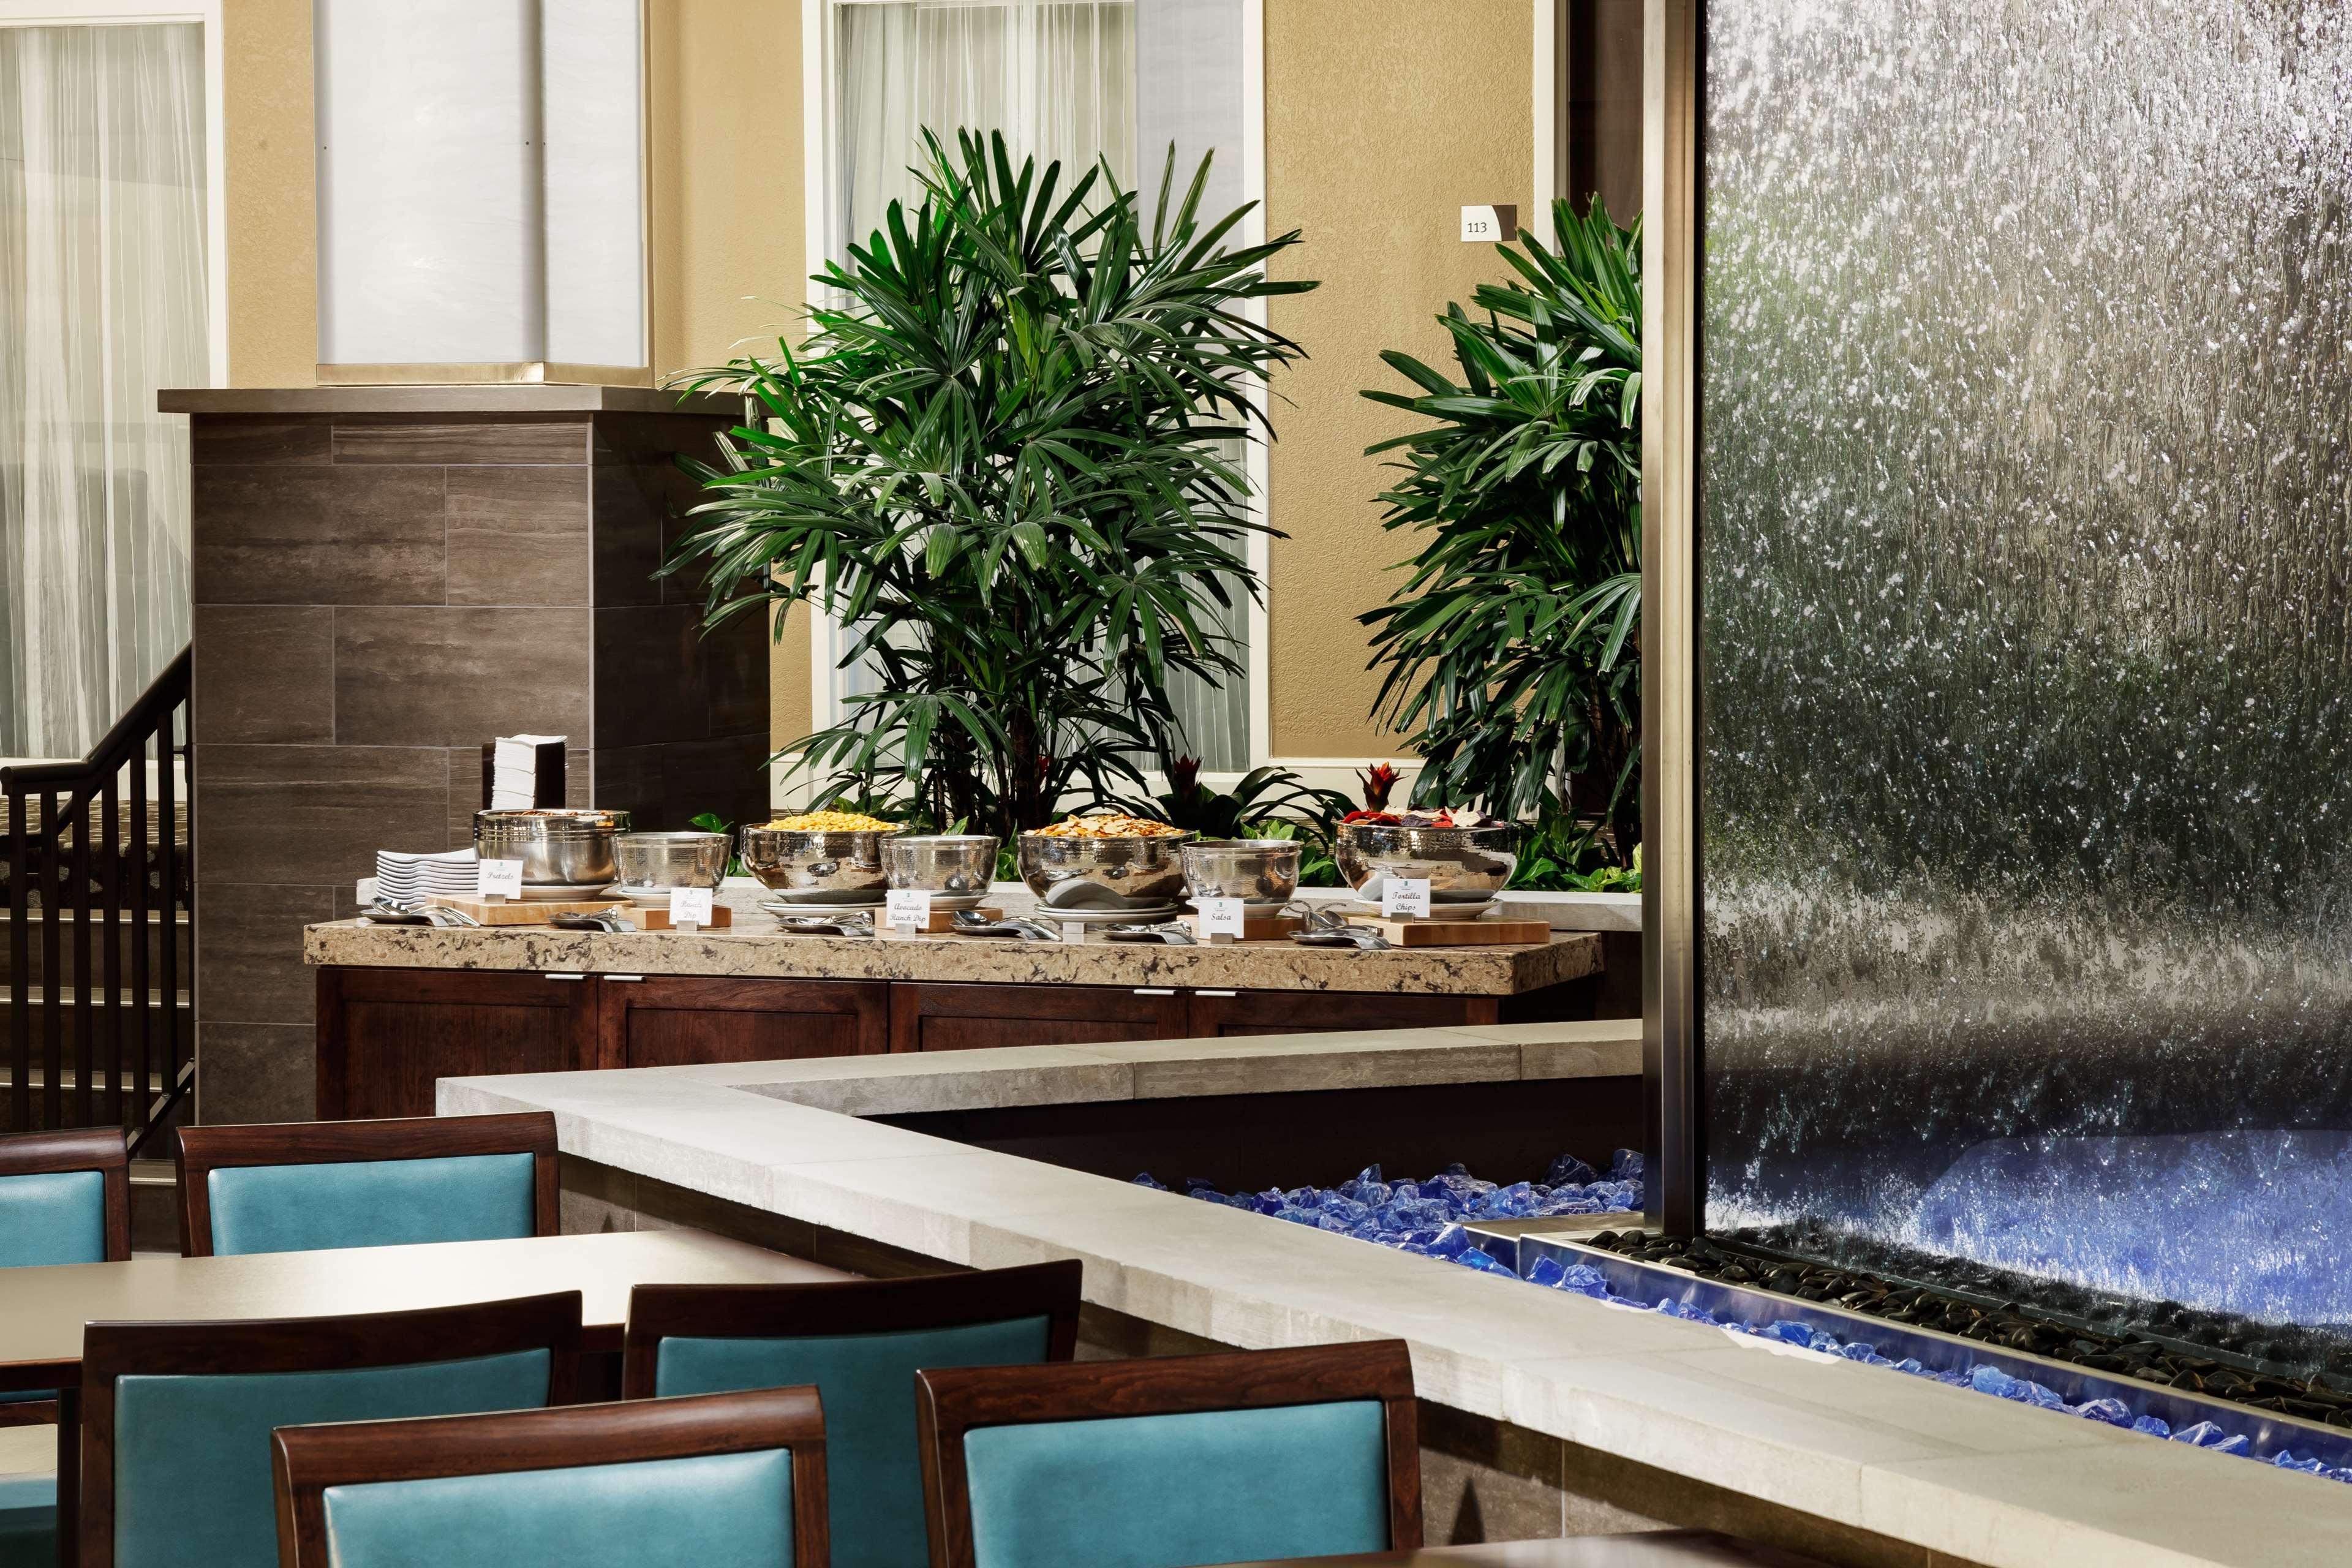 Embassy Suites by Hilton Orlando Lake Buena Vista Resort image 13